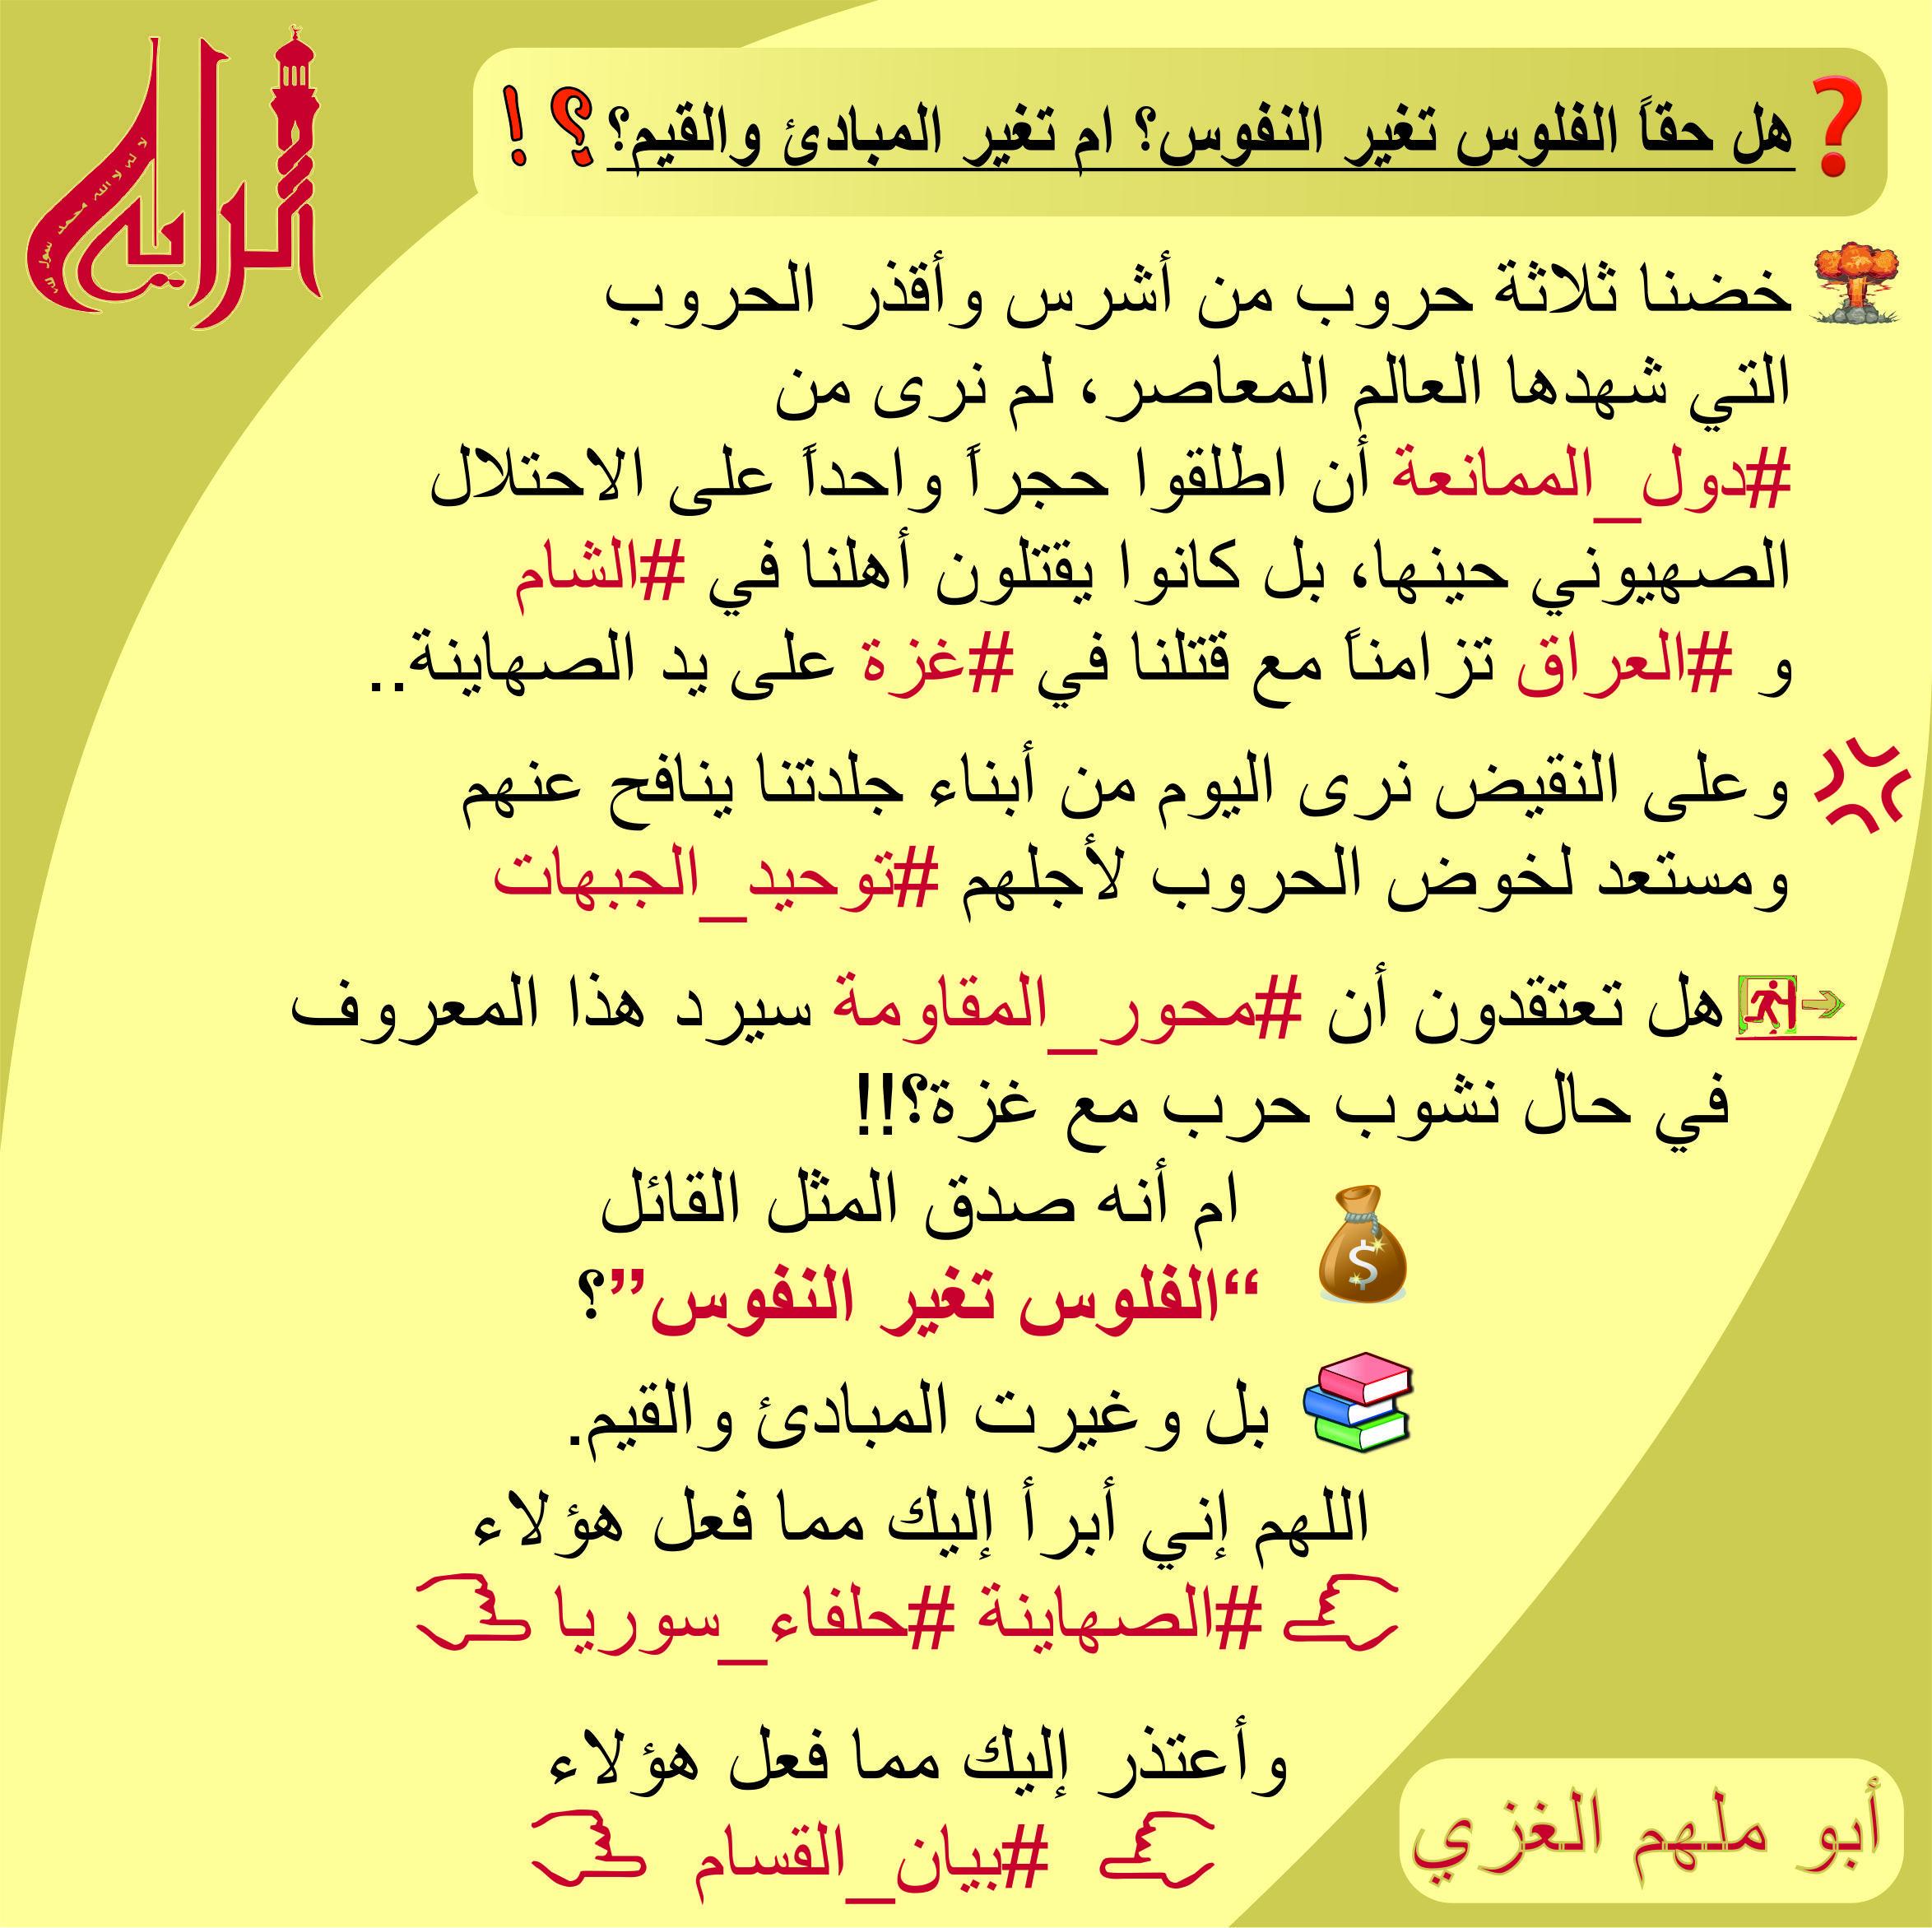 الفلوس تغير النفوس Arabic Calligraphy Photo Calligraphy